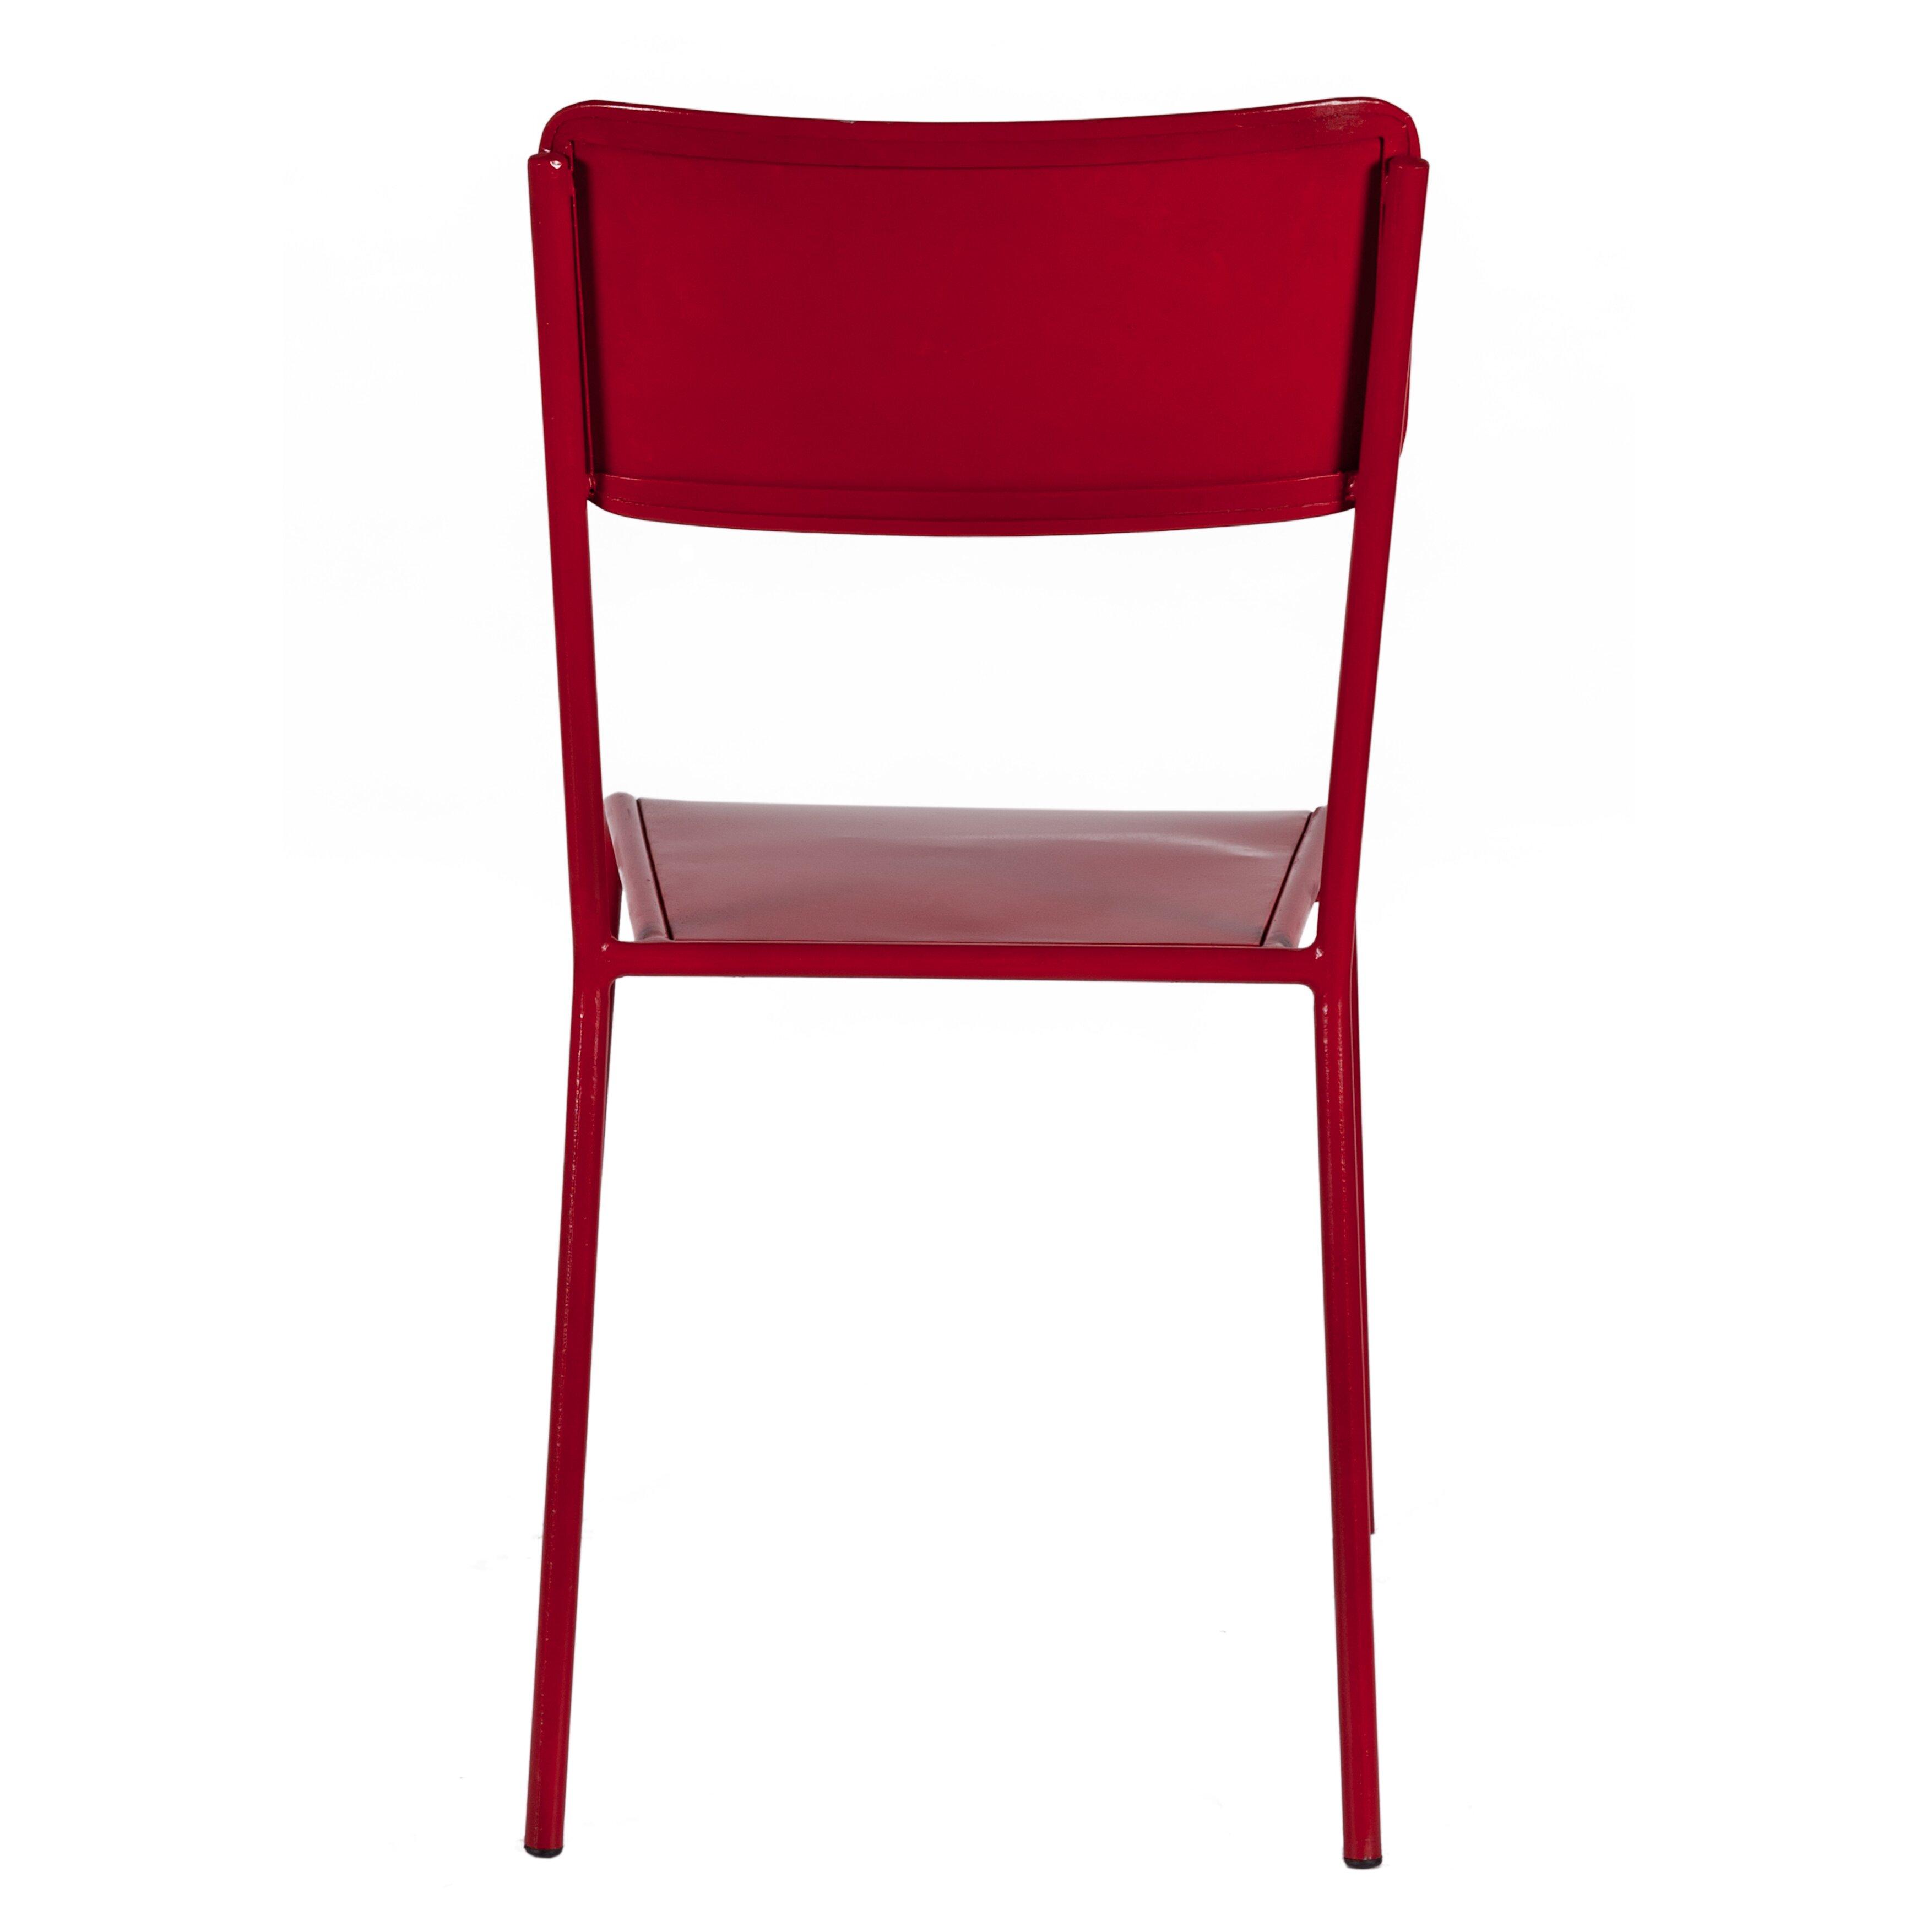 SIT Möbel Airman Dining Chair & Reviews  Wayfaircouk